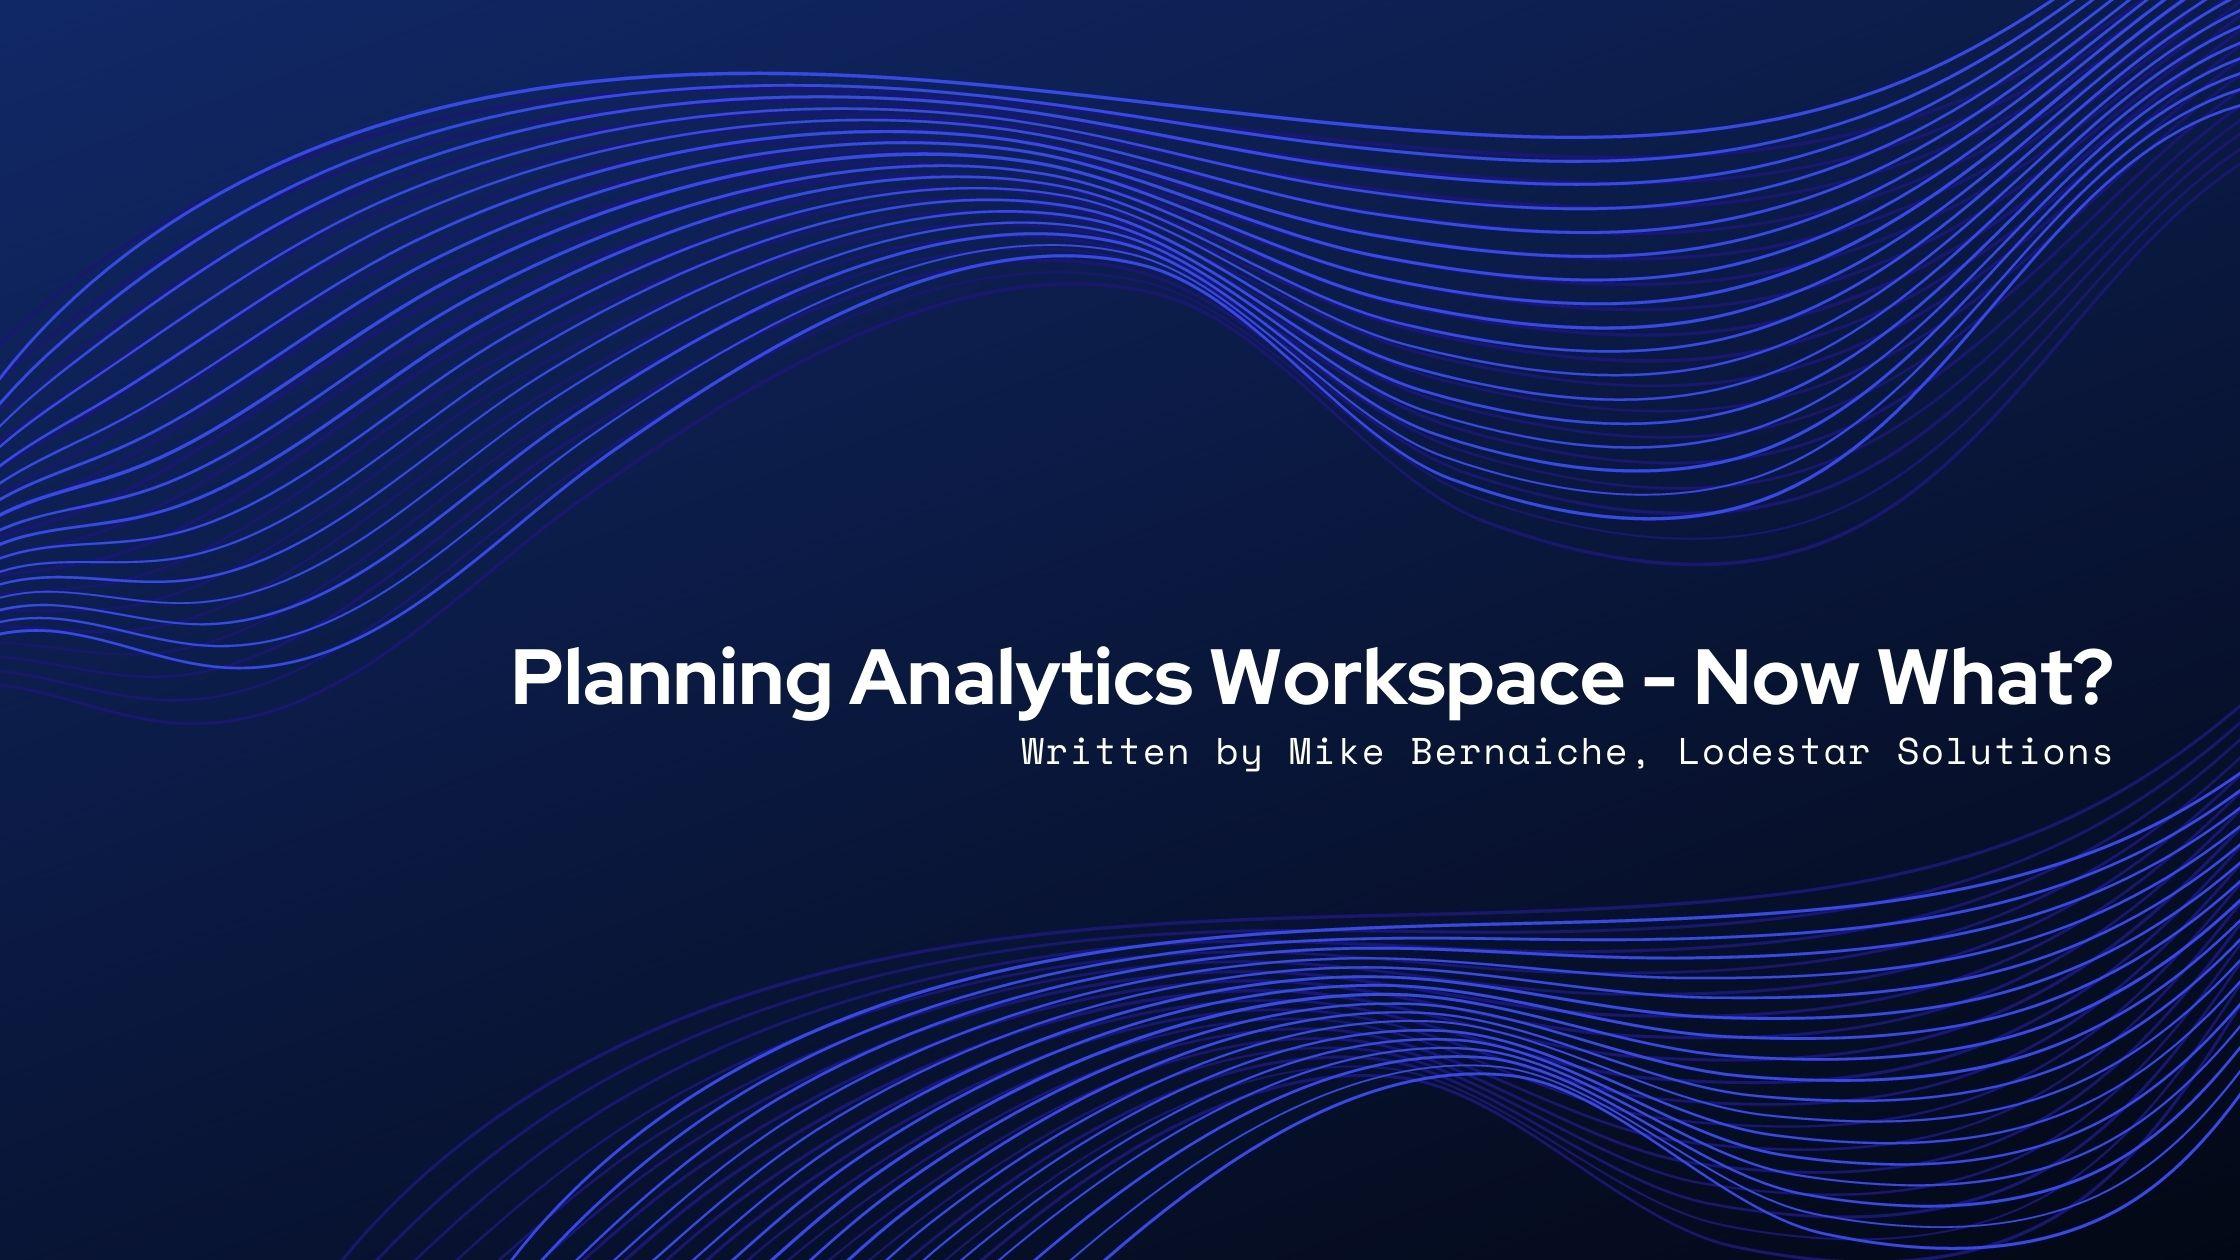 Planning Analytics Workspace - Now What?